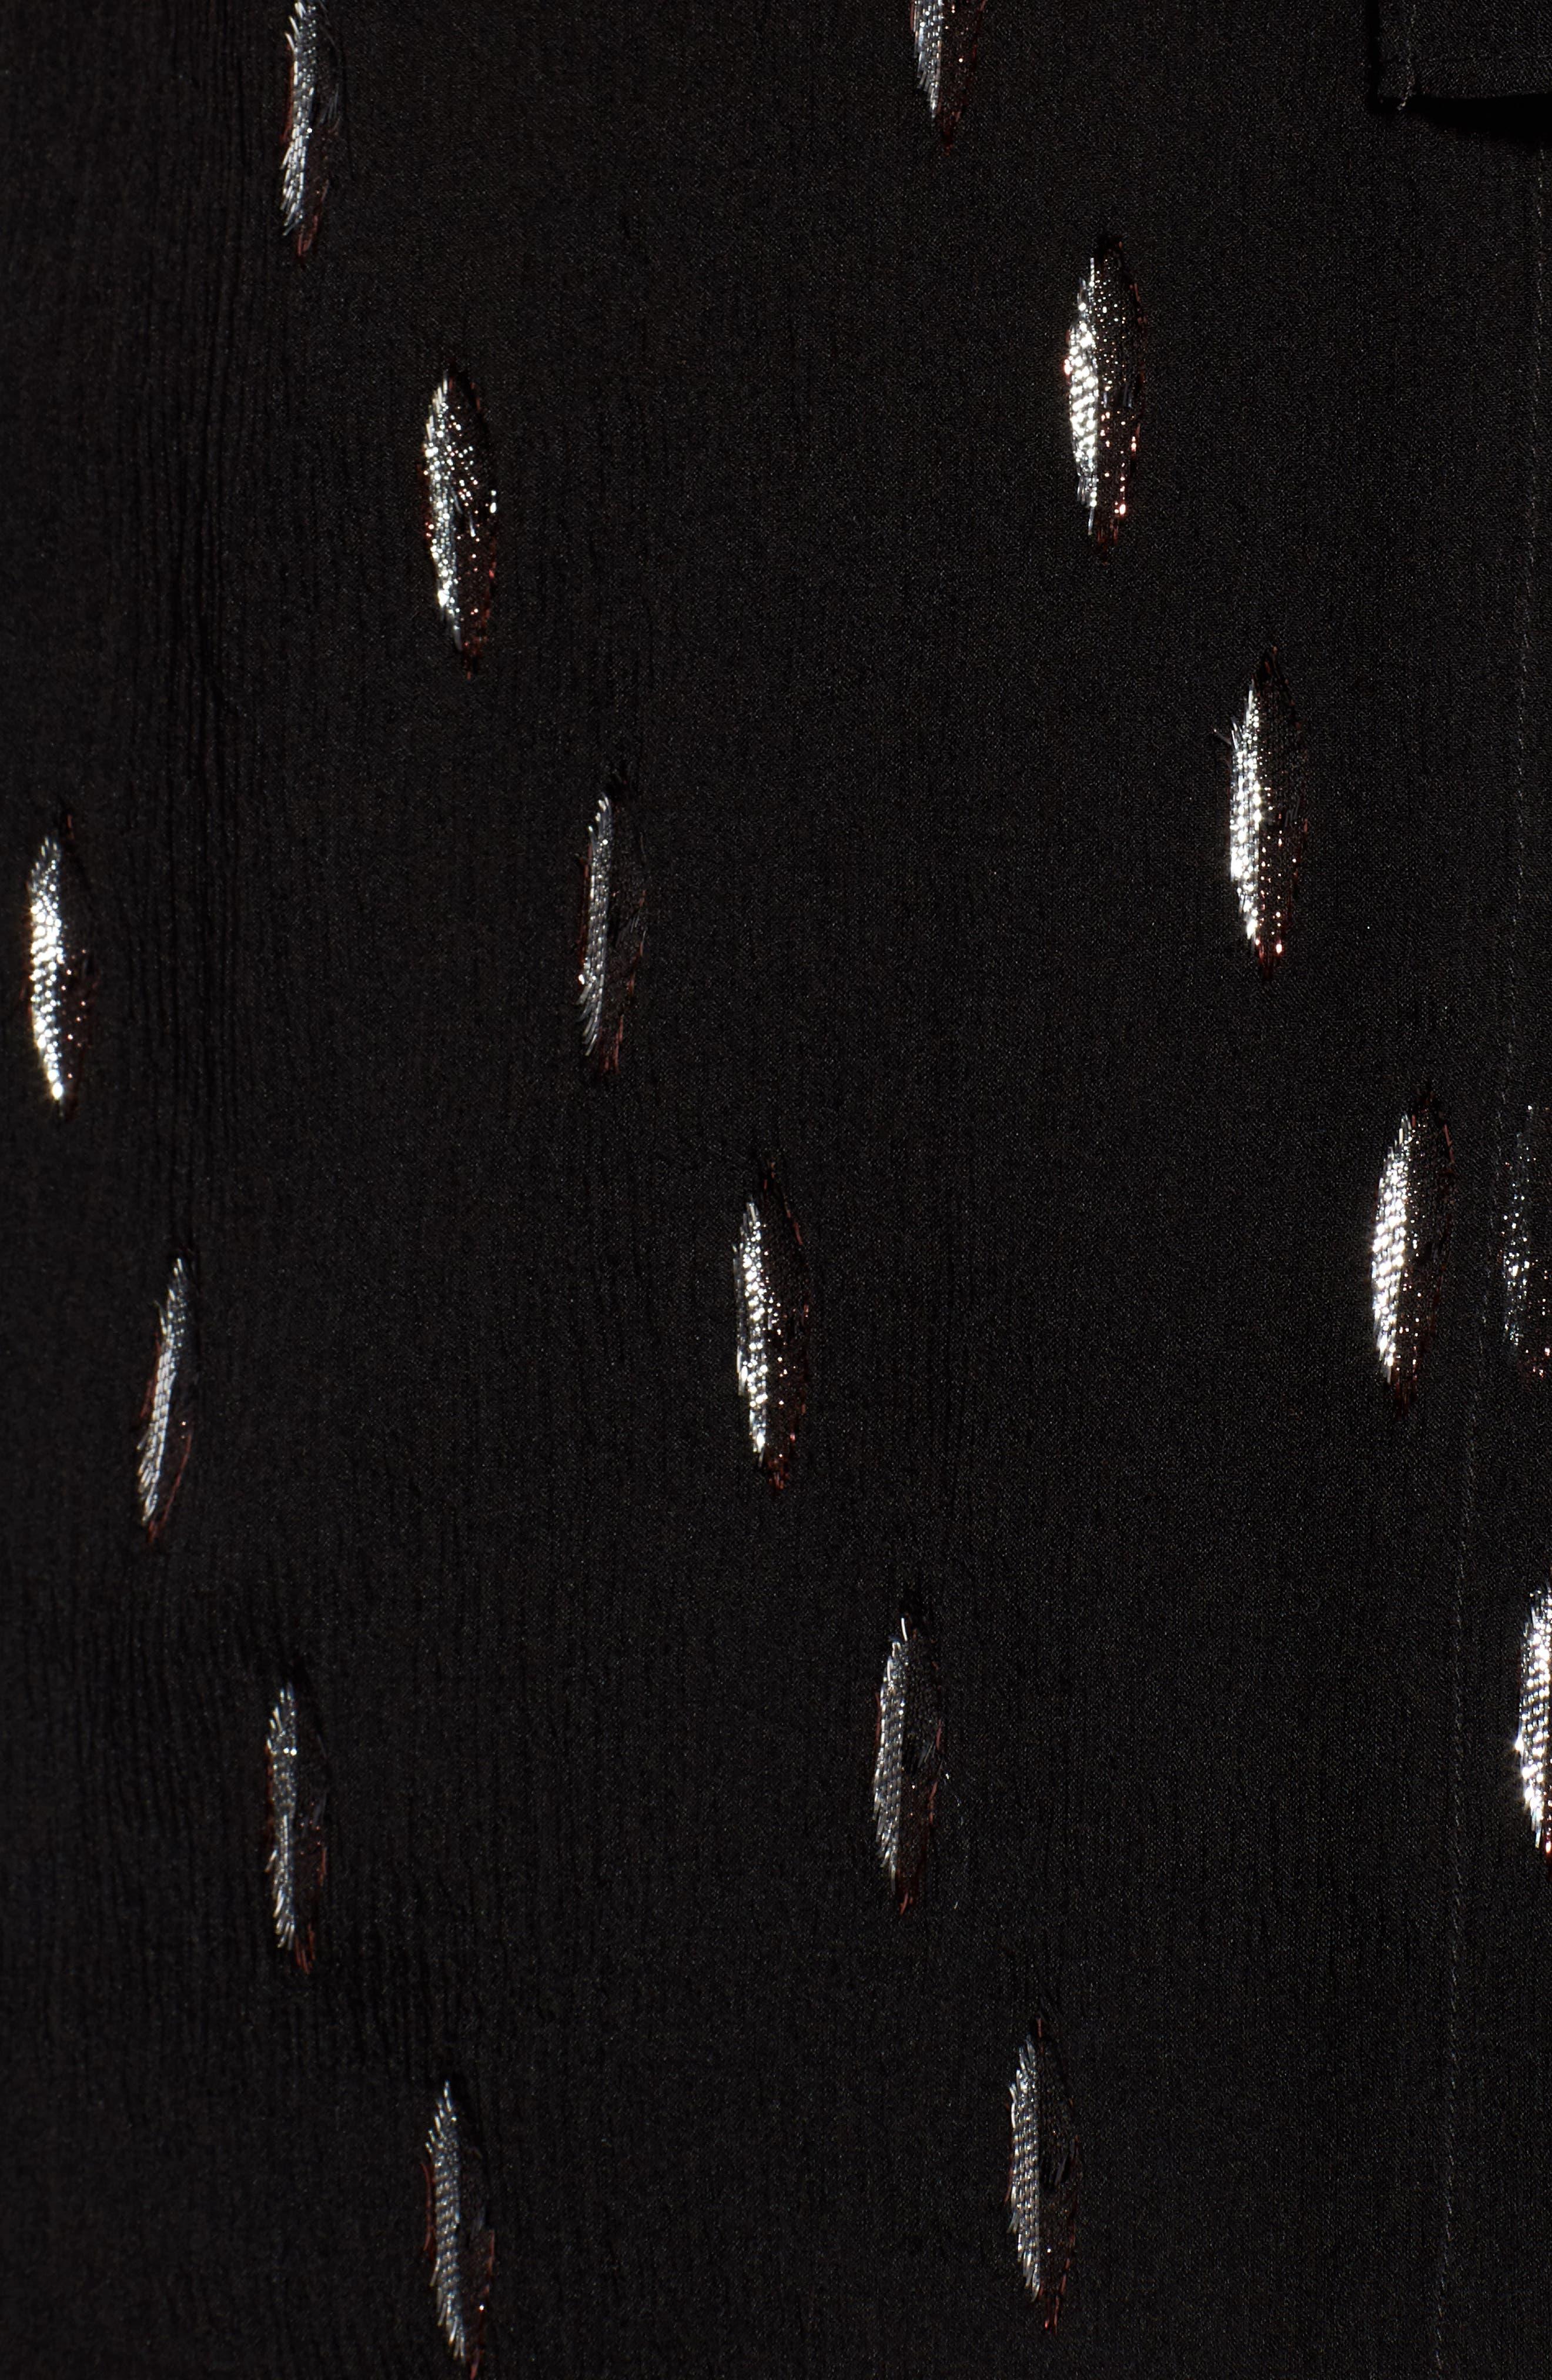 Bavimea Tie Neck Metallic Detail Blouse,                             Alternate thumbnail 6, color,                             Black Fantasy